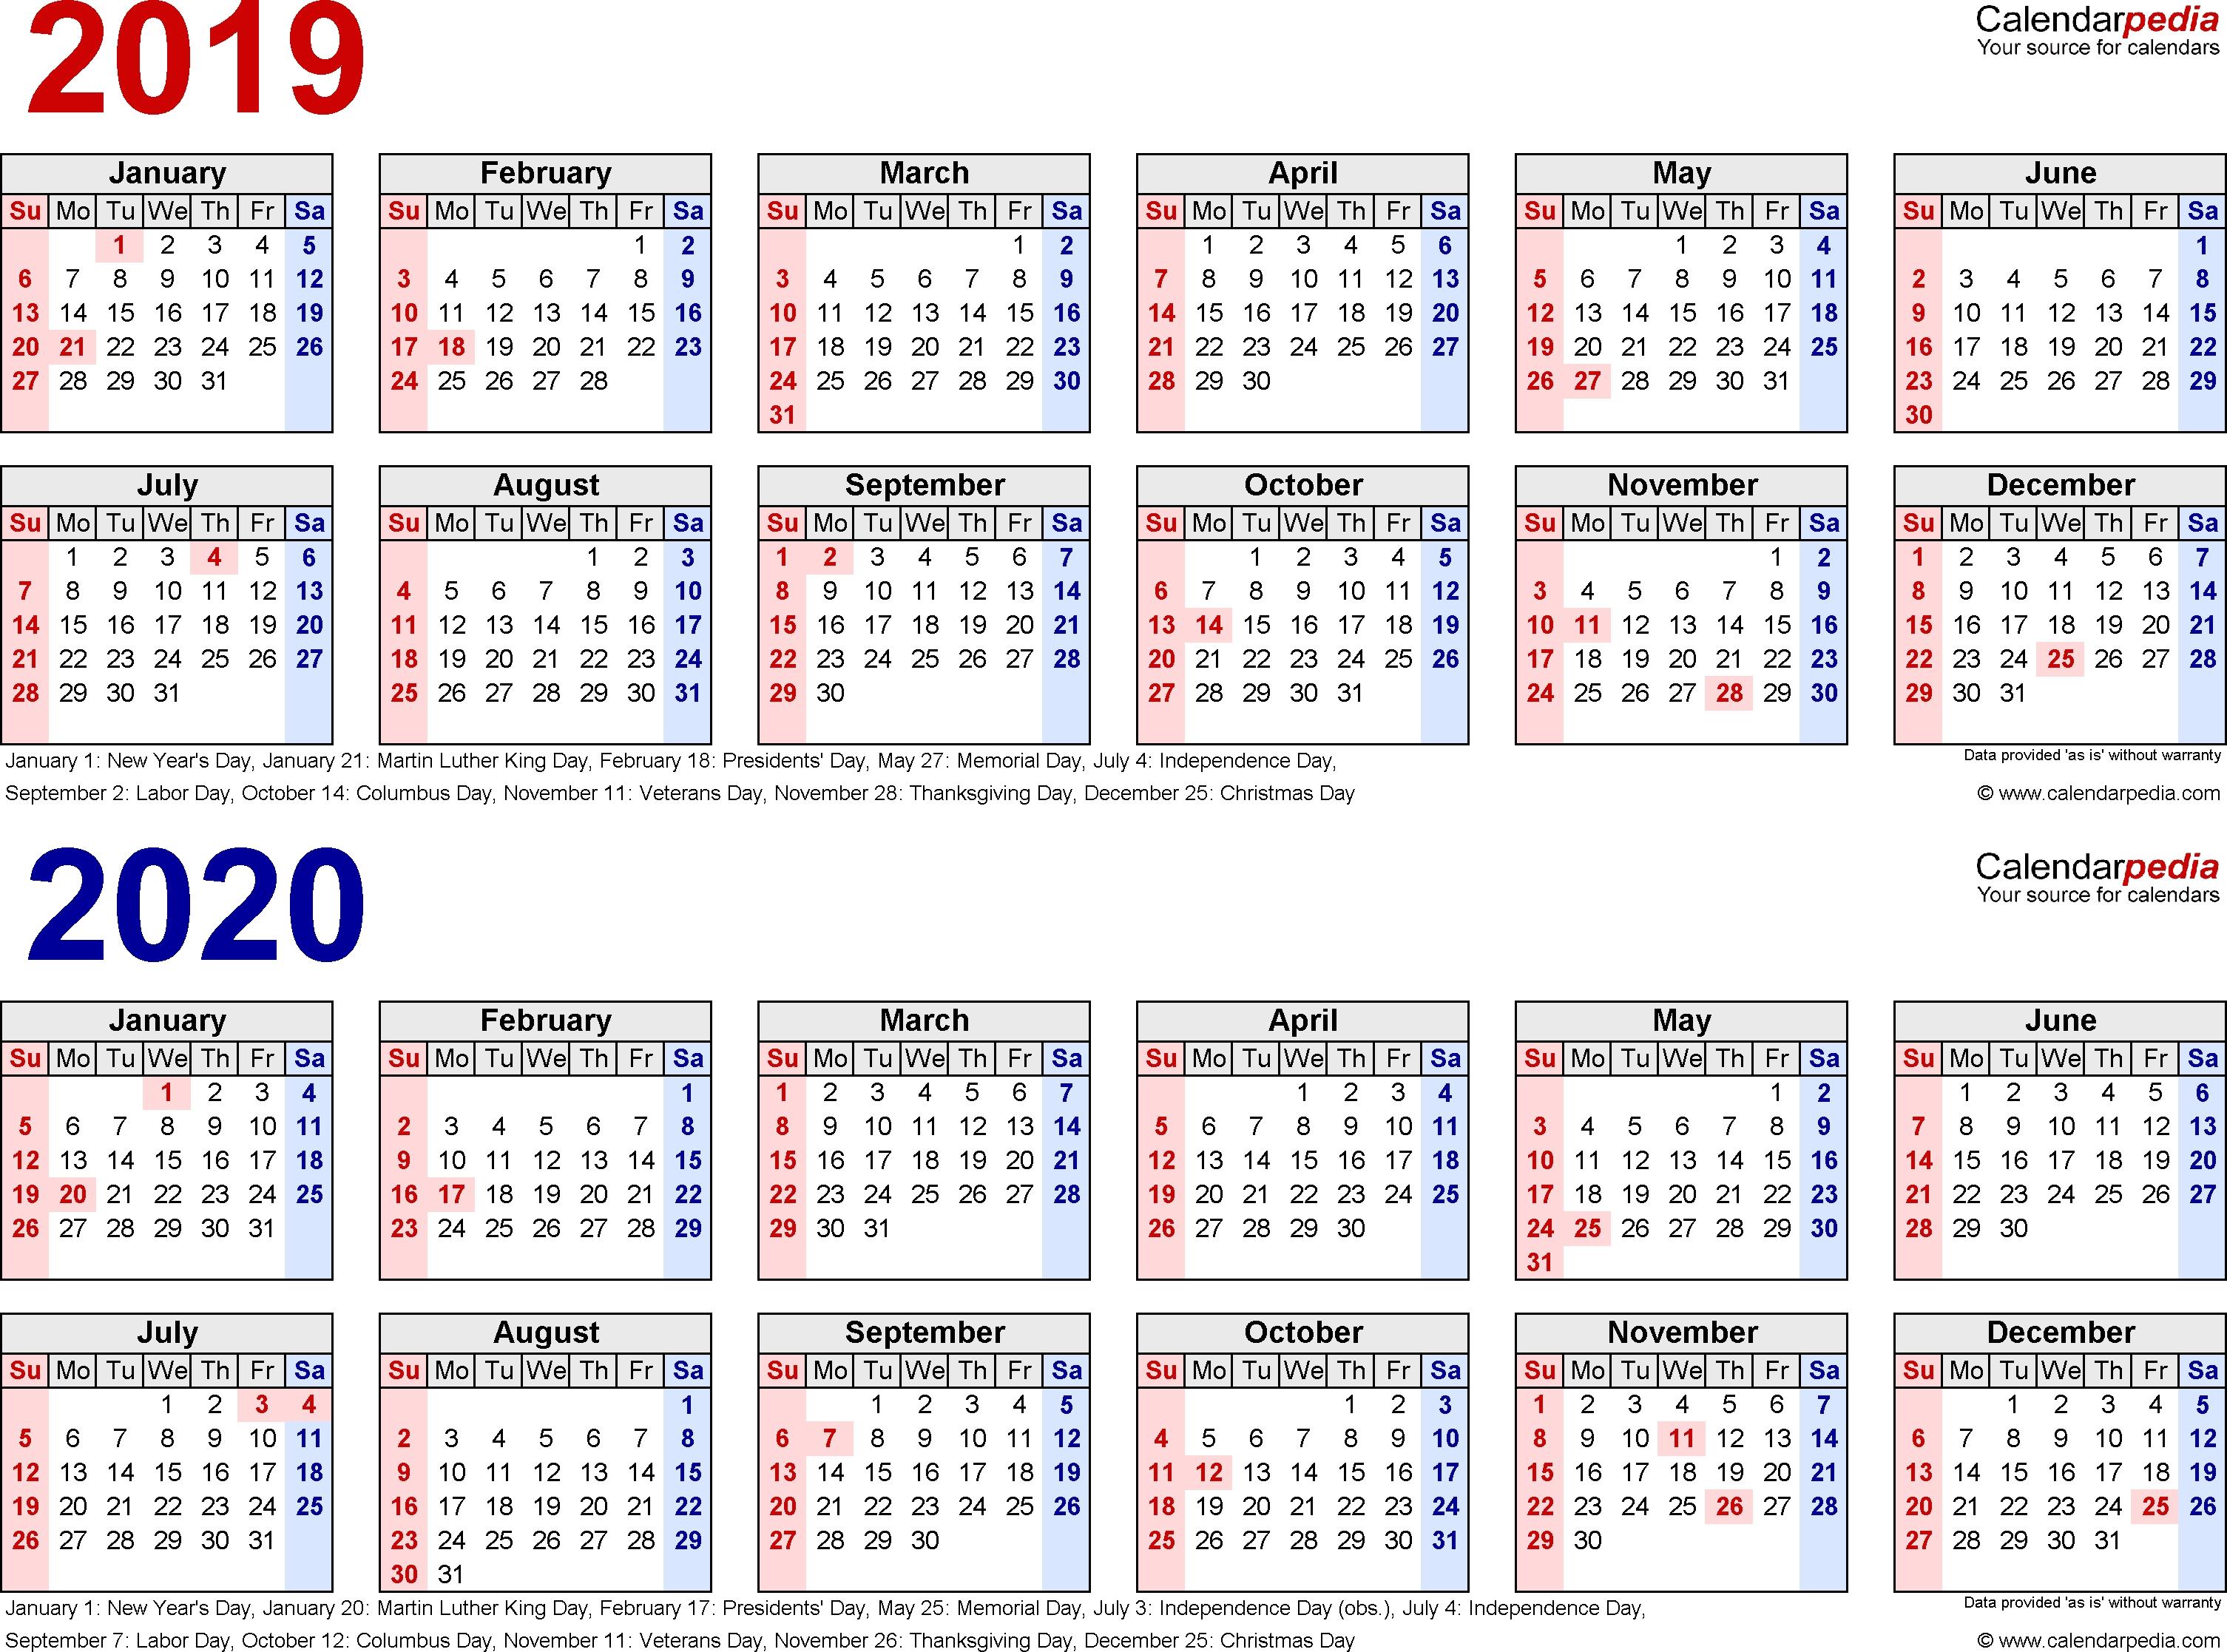 2019-2020 Calendar - Free Printable Two-Year Excel Calendars in 2019-2020 Vacation Calendar